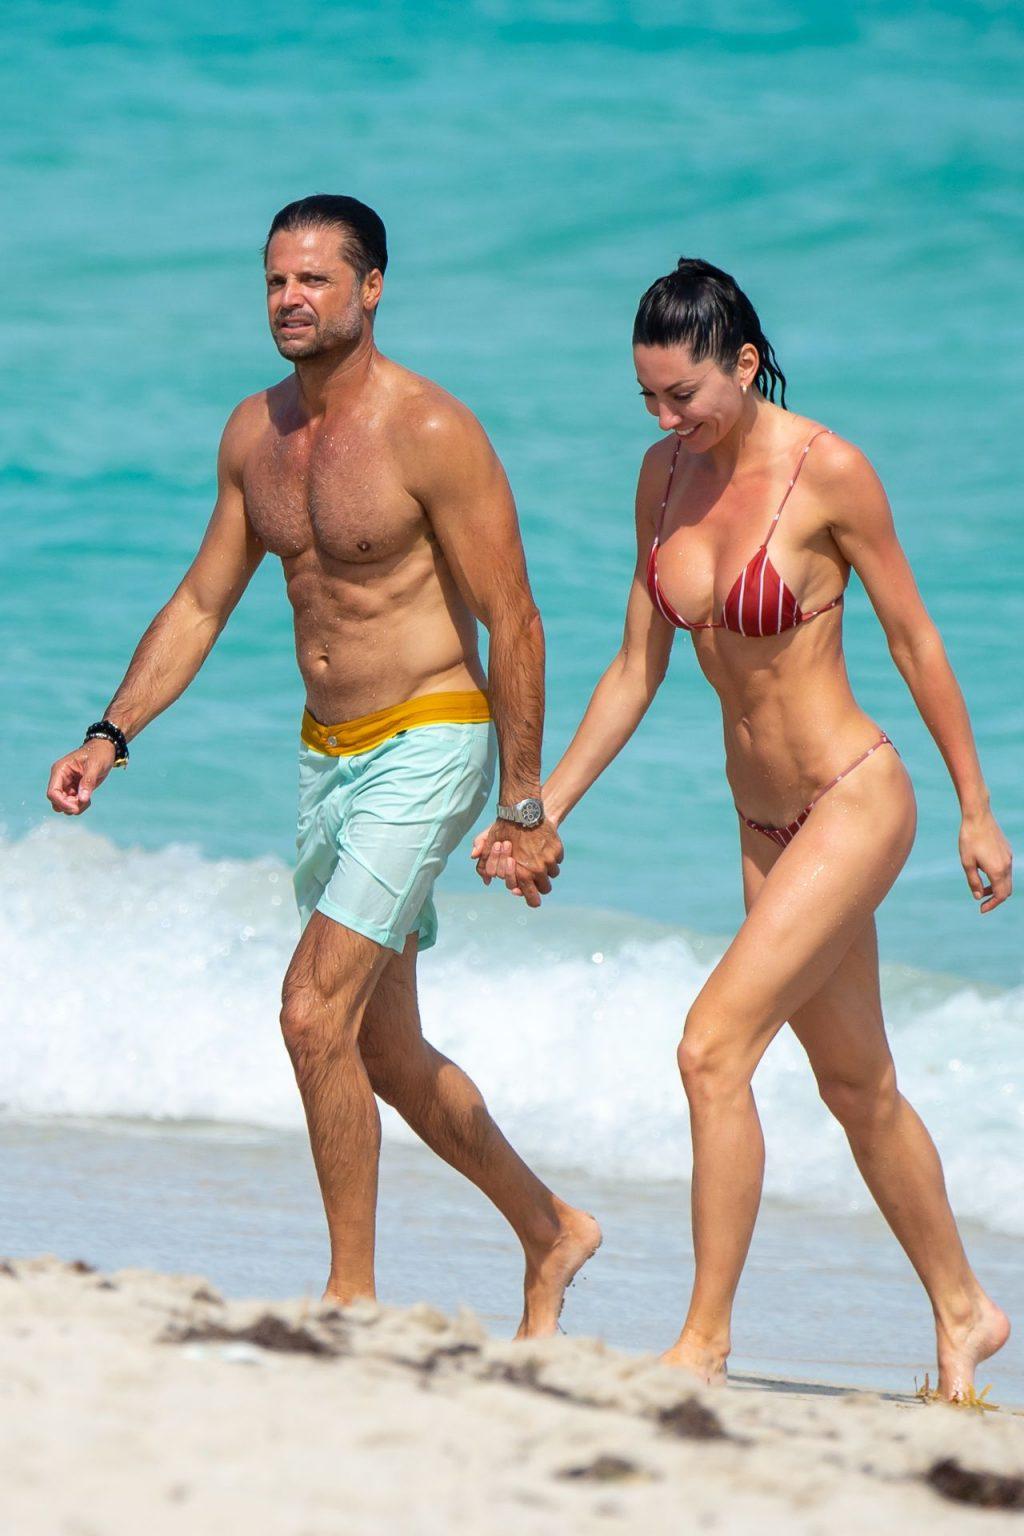 David Charvet Enjoys a Steamy Miami Beach Vacation with His Mystery Brunette (20 Photos)